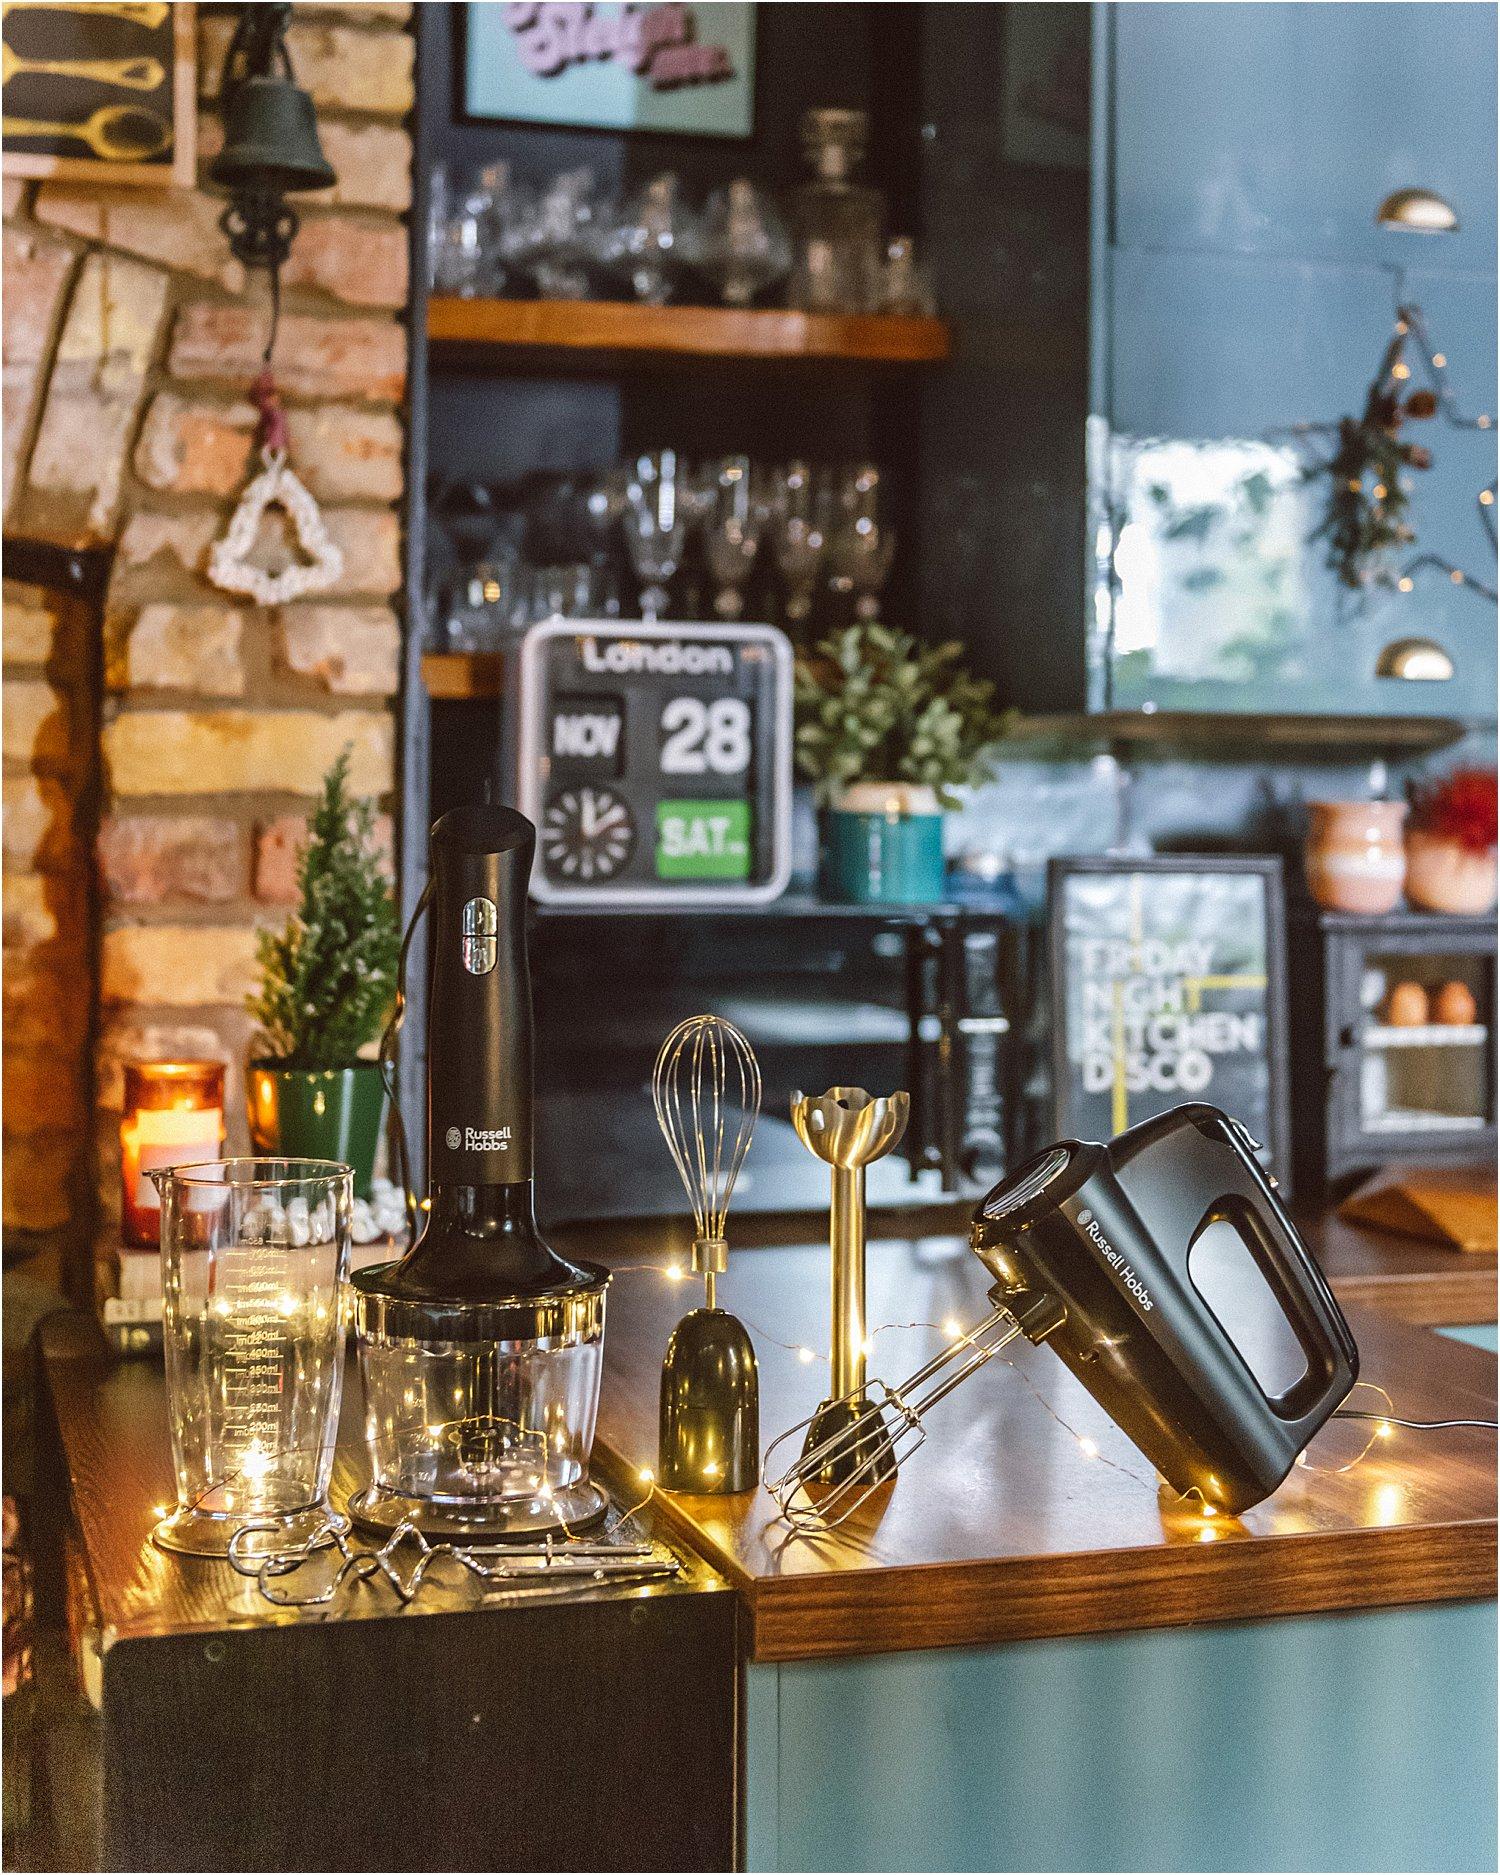 russell-hobbs-hand-mixer-3-in-1-blender-christmas-present